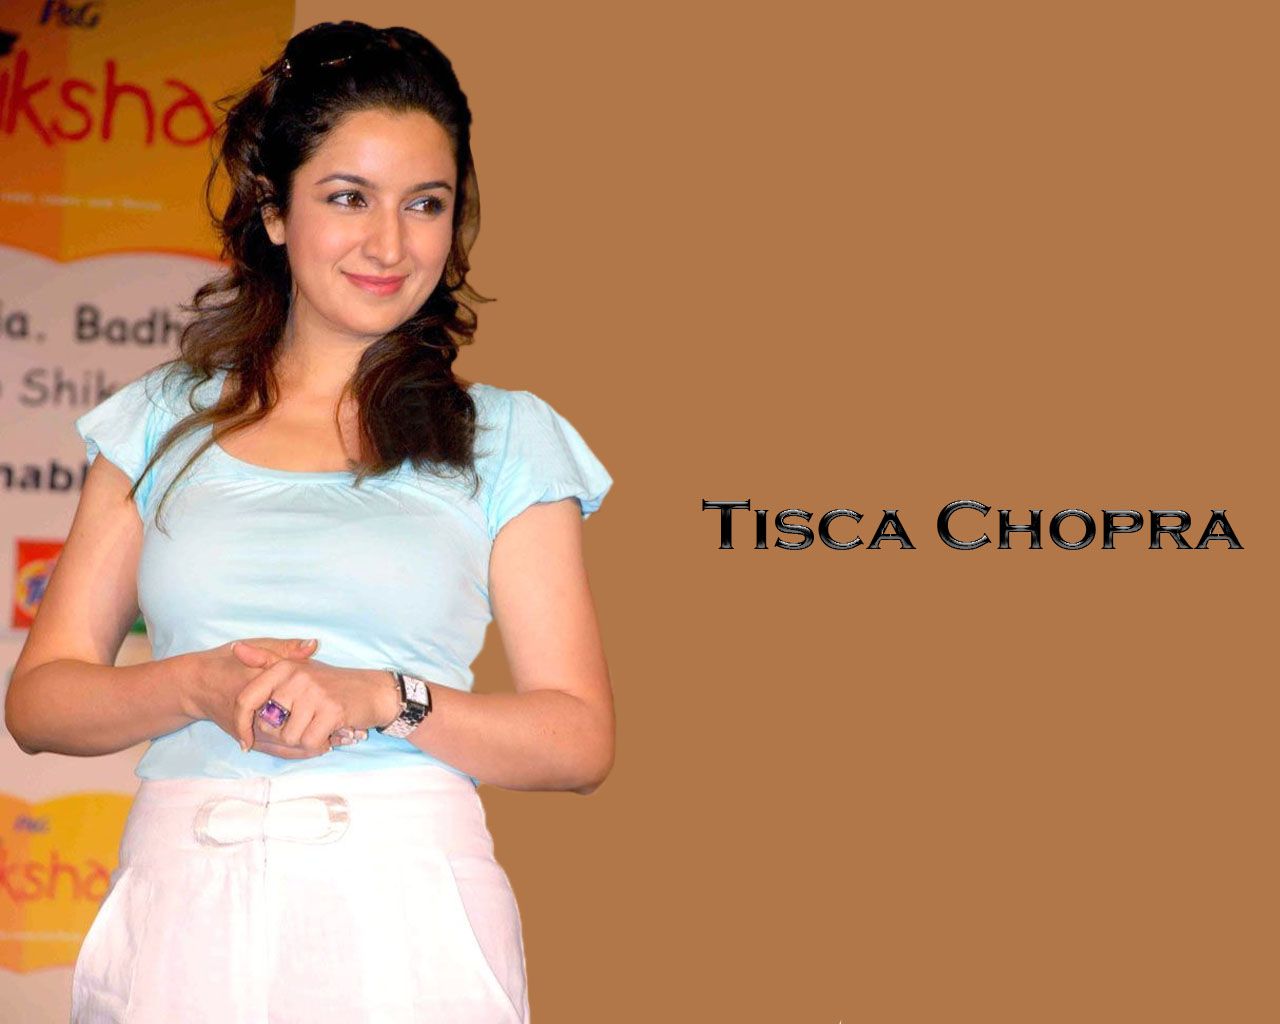 http://4.bp.blogspot.com/_RVTXL4Tq5jk/TVJzlfqehvI/AAAAAAAAHs8/aOVMy_oLxS4/s1600/tisca-chopra-hot.jpg